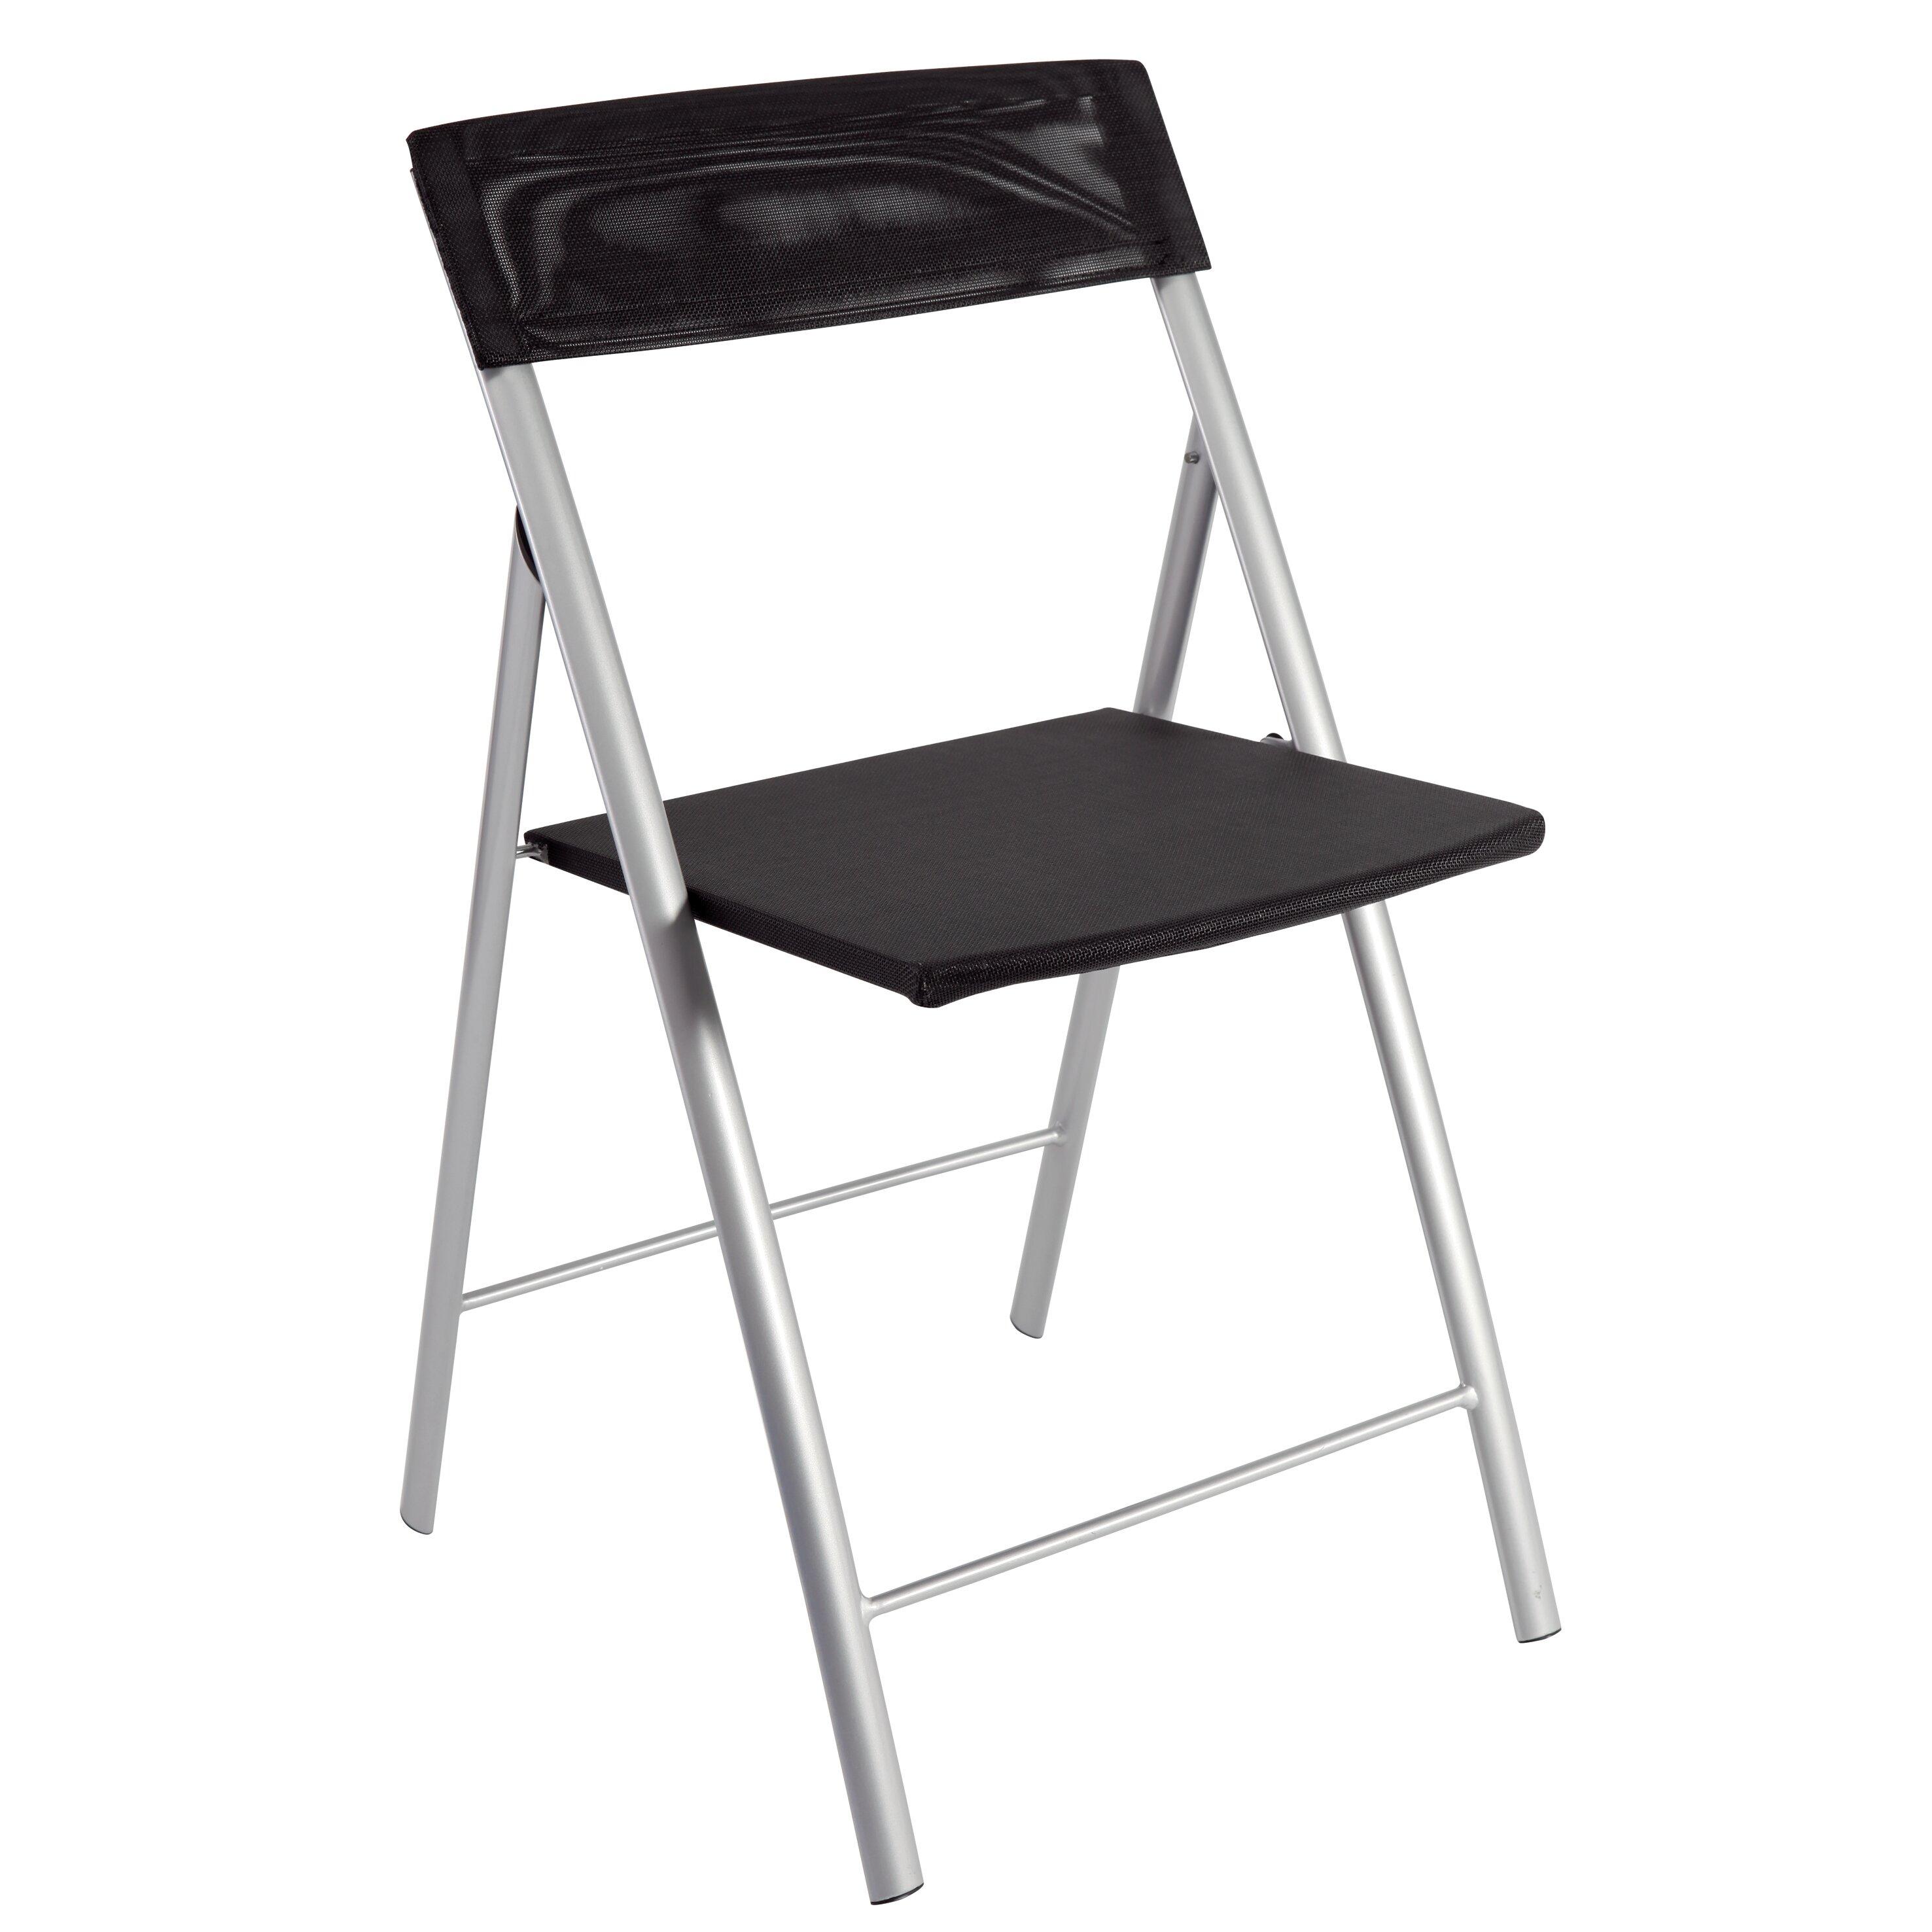 Alba Mesh Folding chair & Reviews